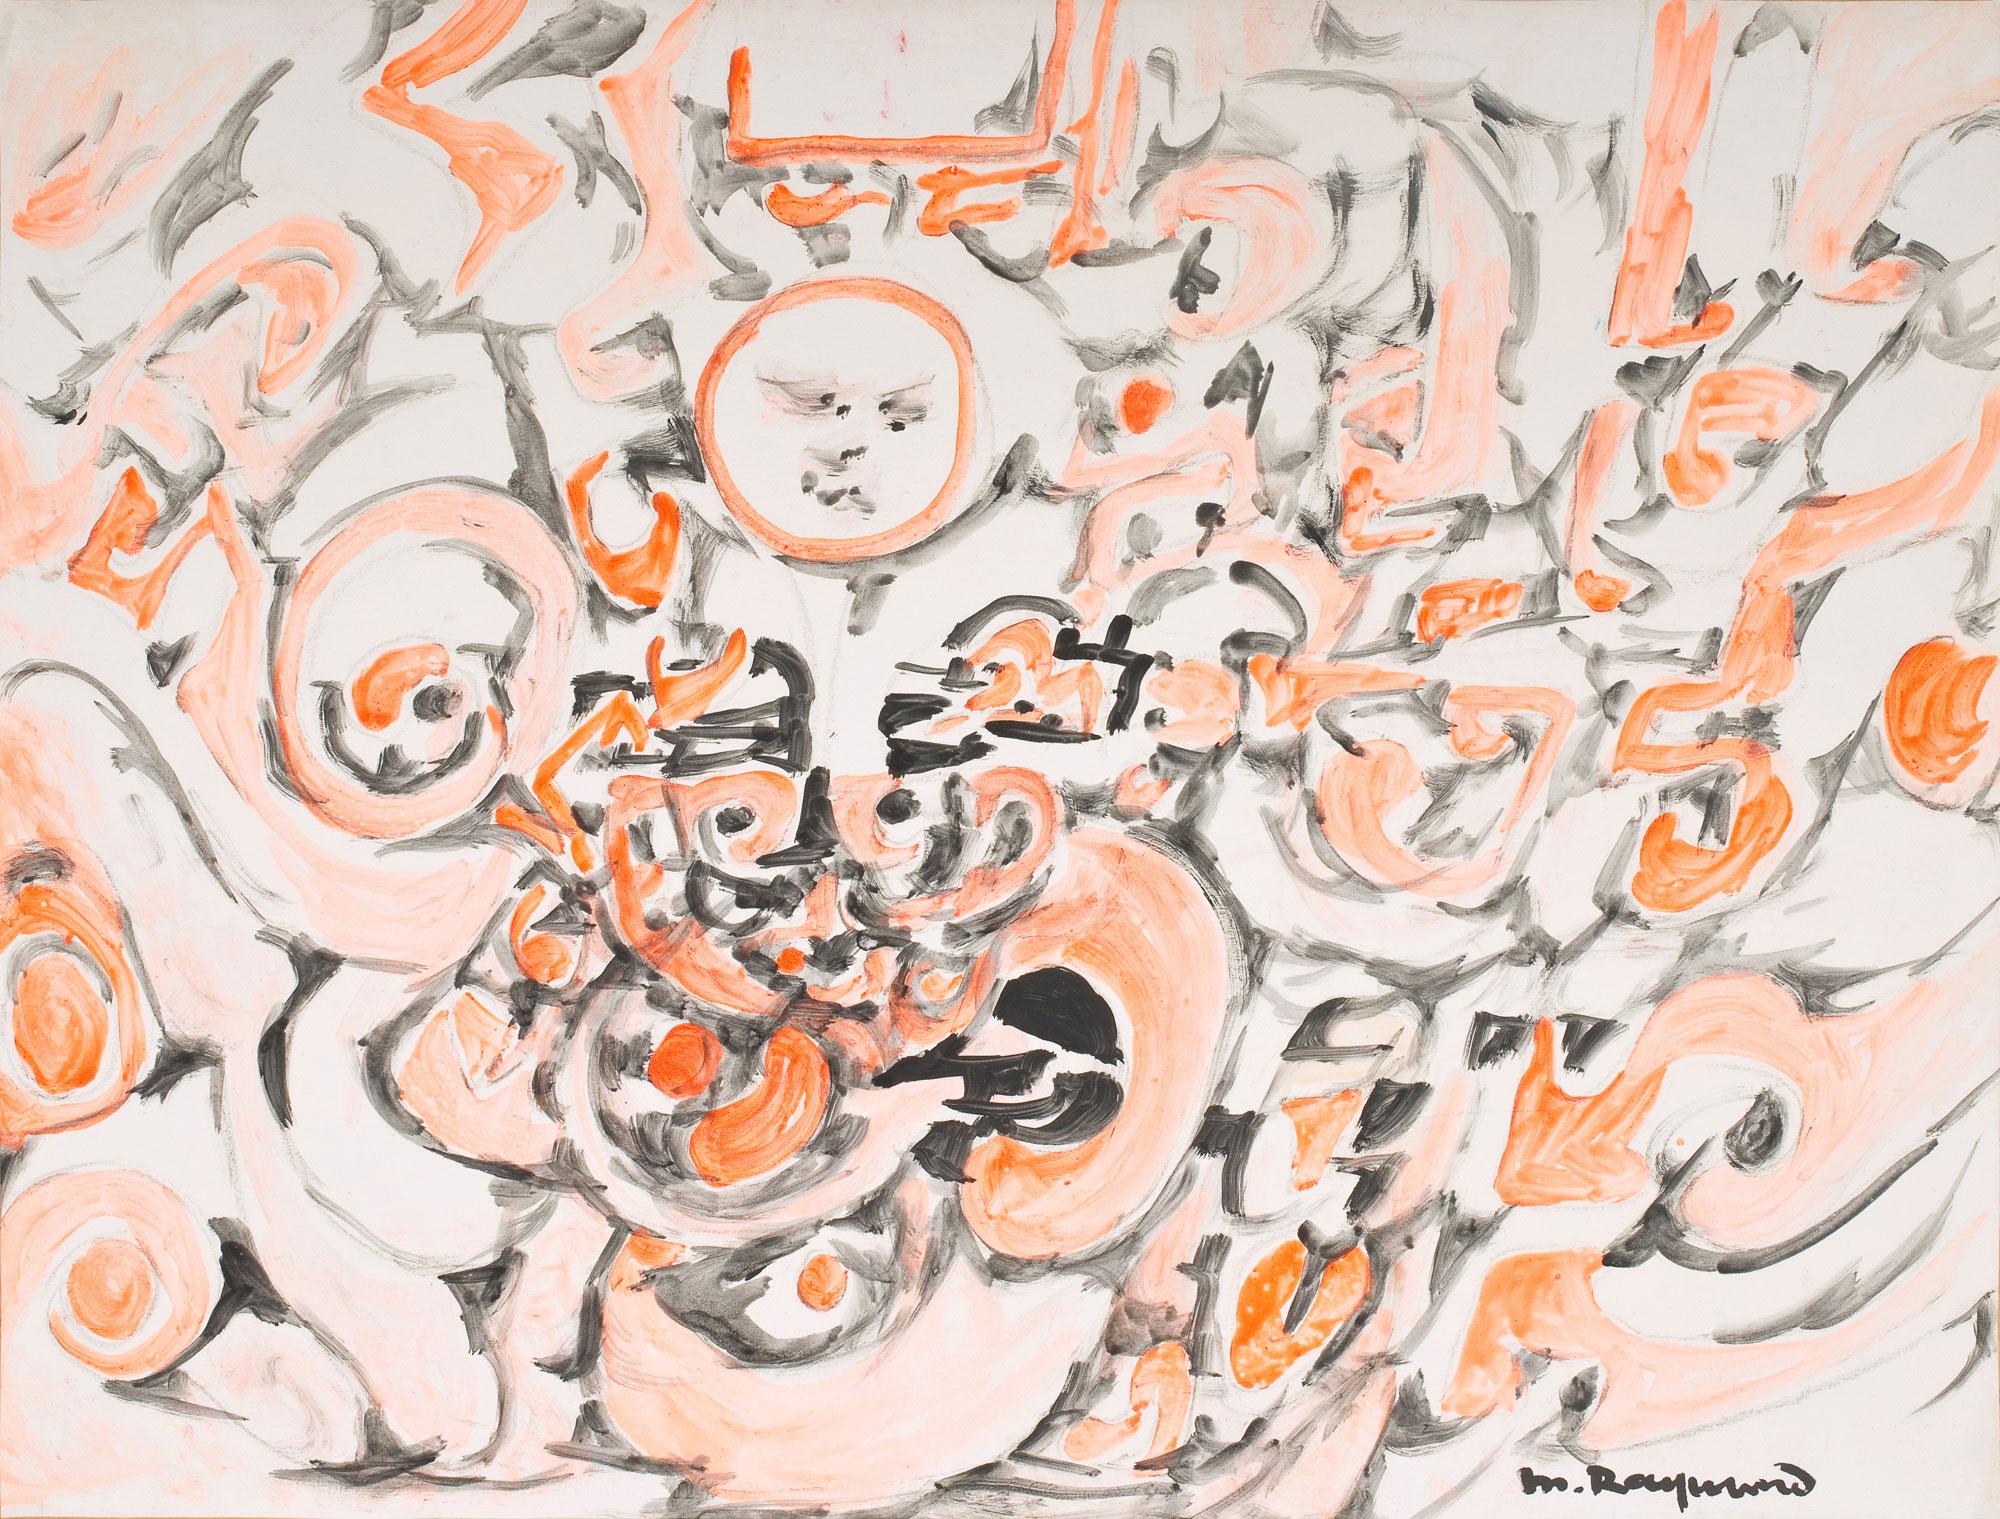 marie raymond - untitled painting 1975